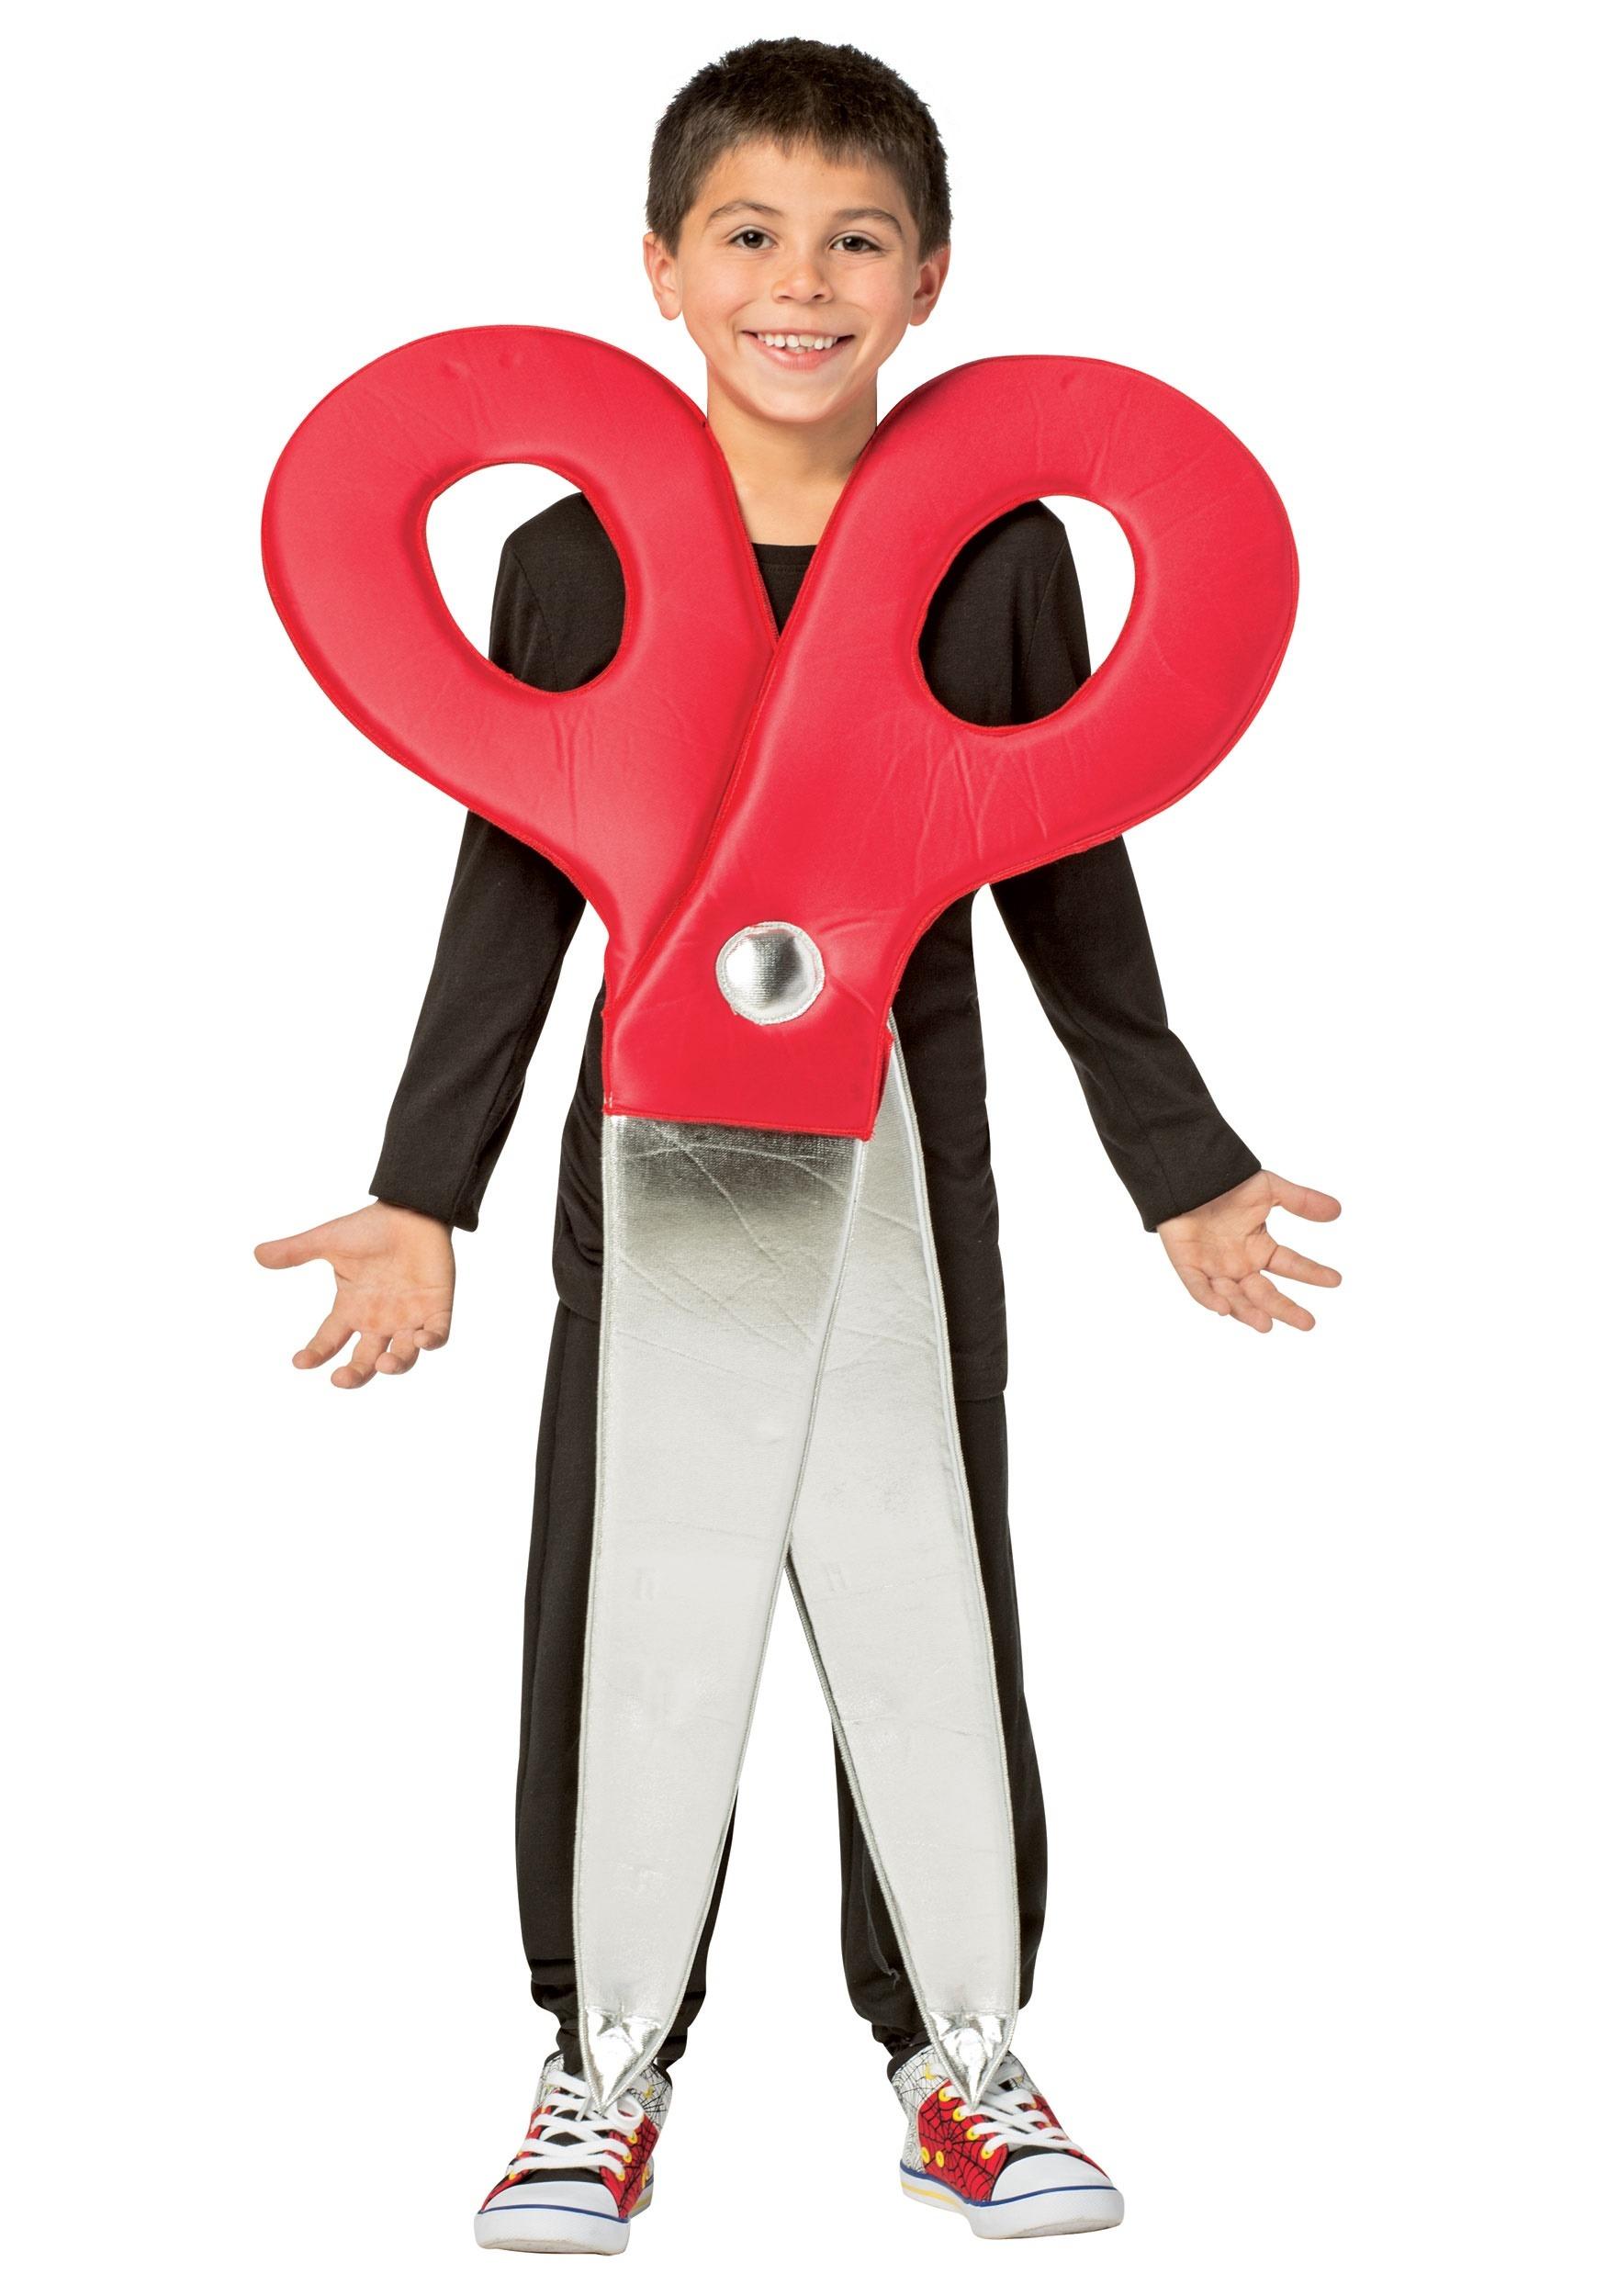 Scissors Costume For Kids